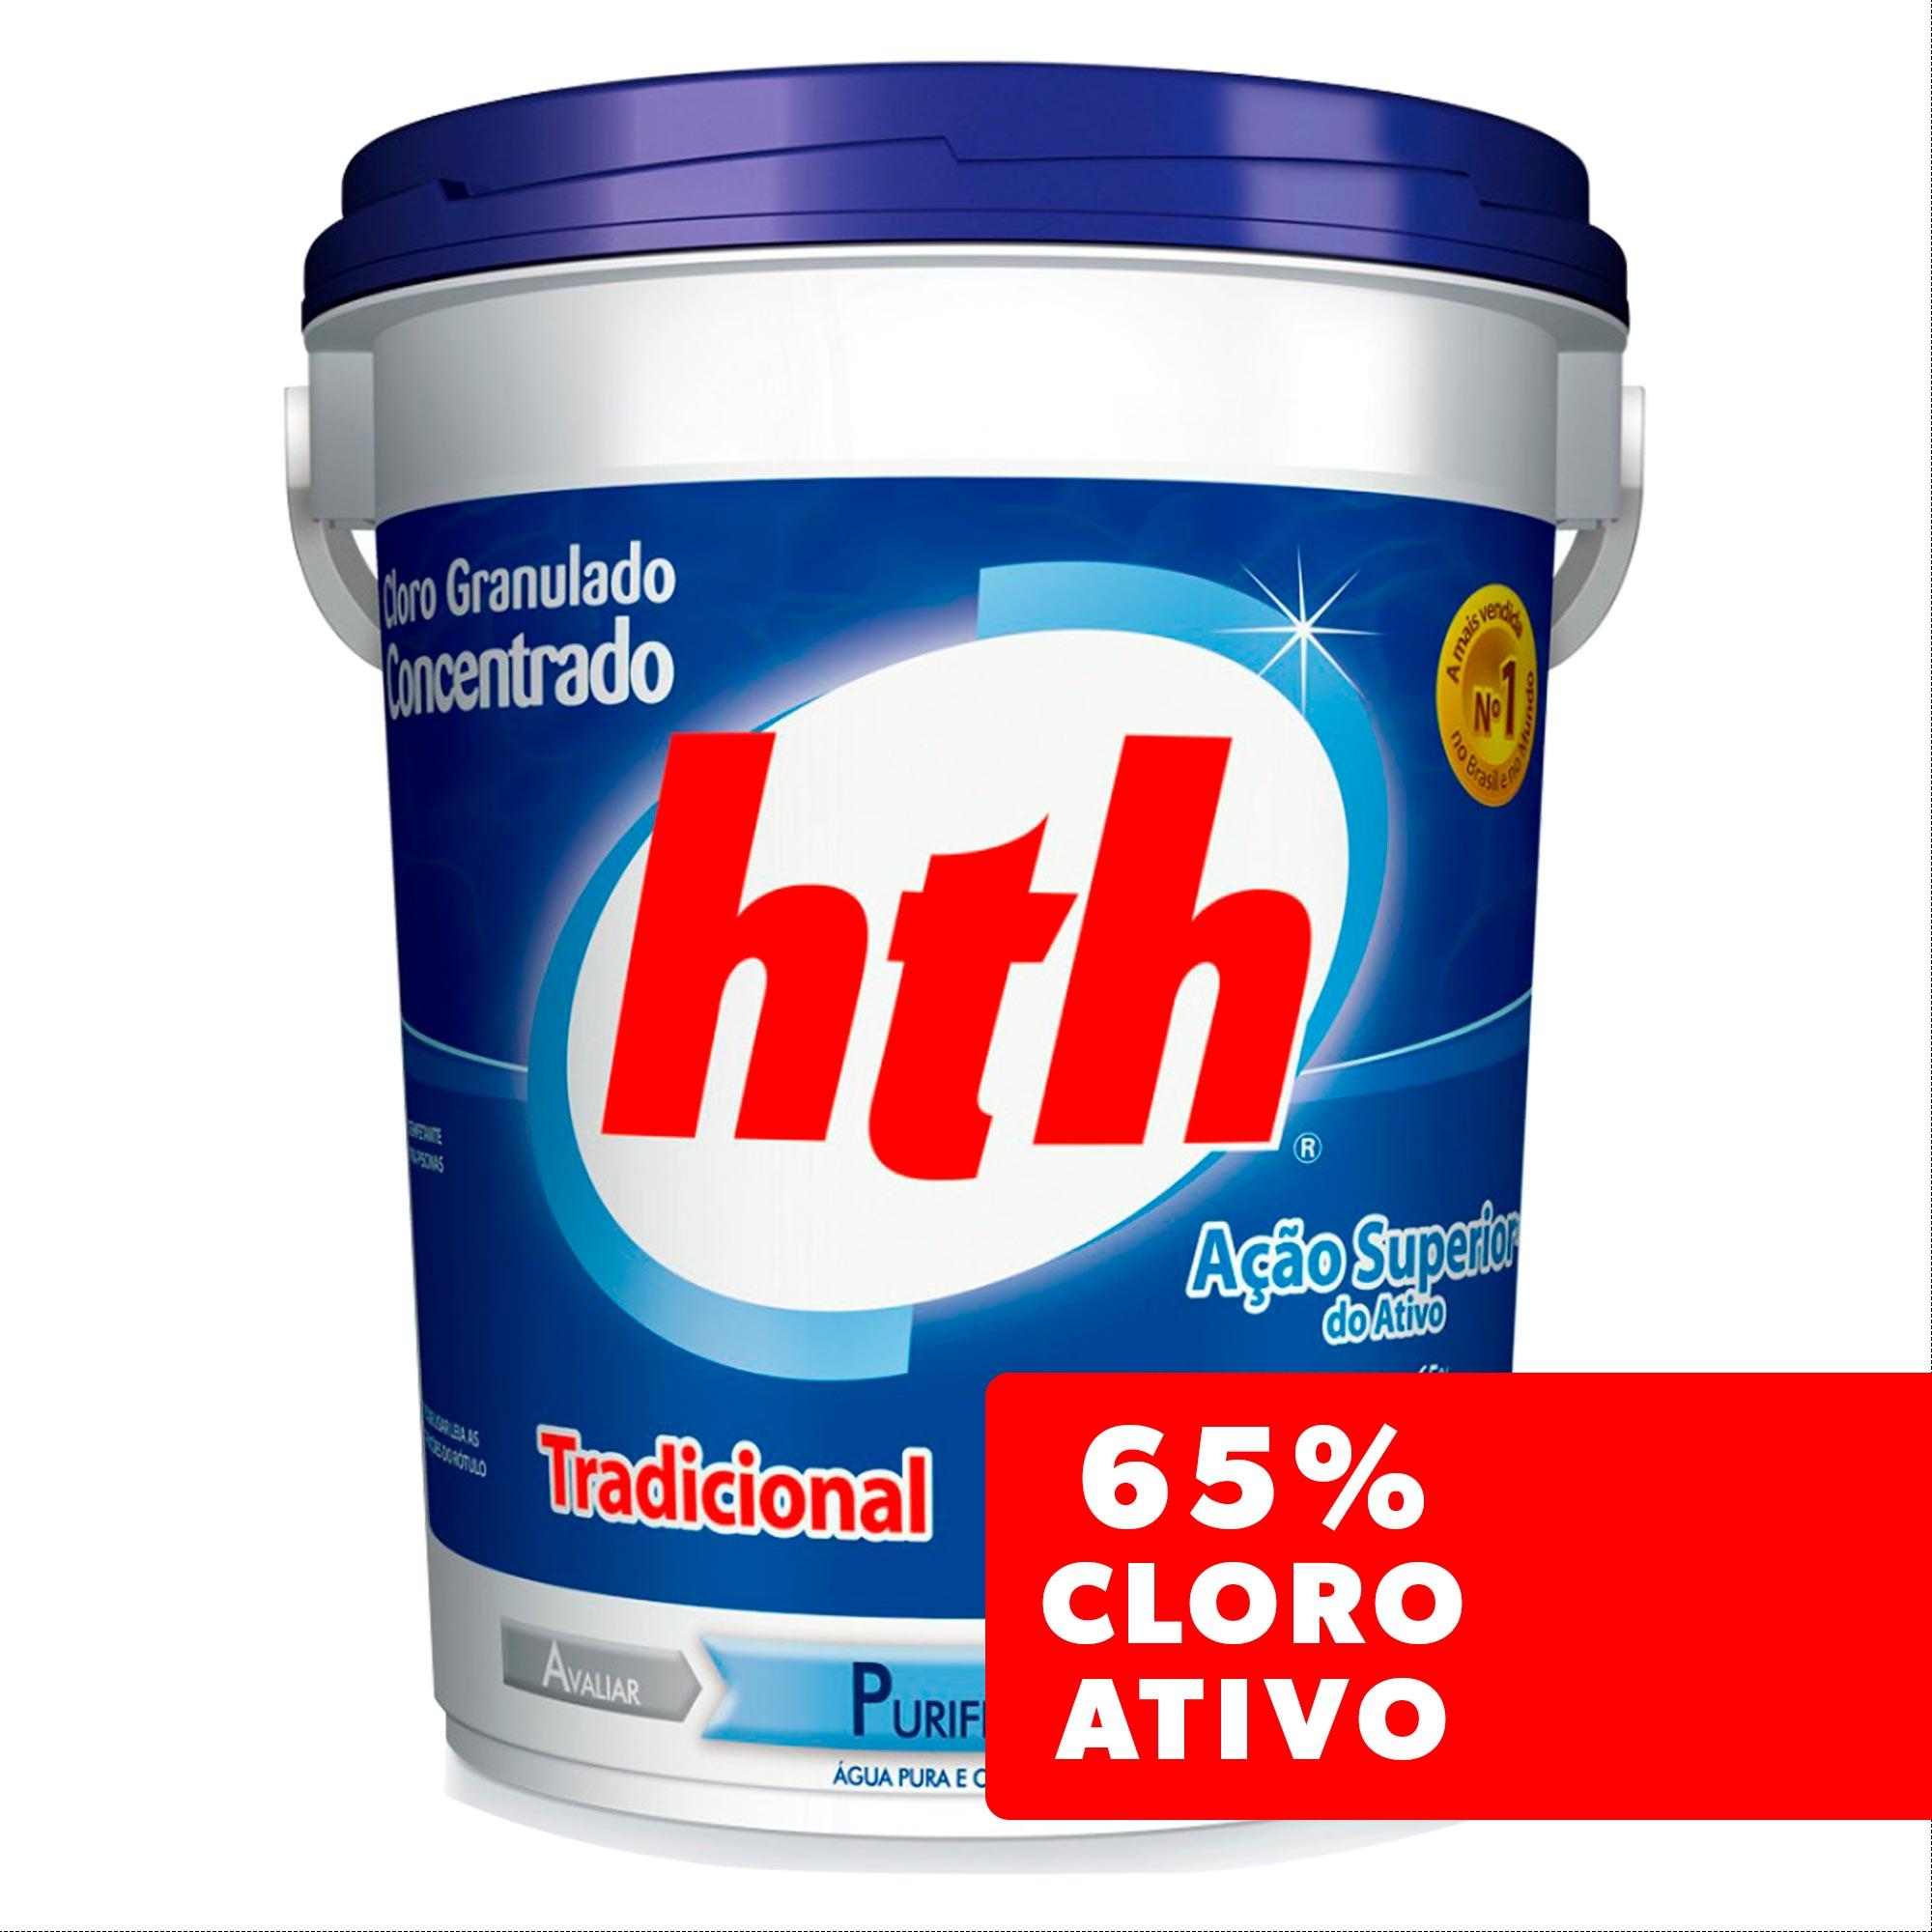 Cloro Granulado HTH Tradicional 65% de Cloro Ativo - 10 Kg